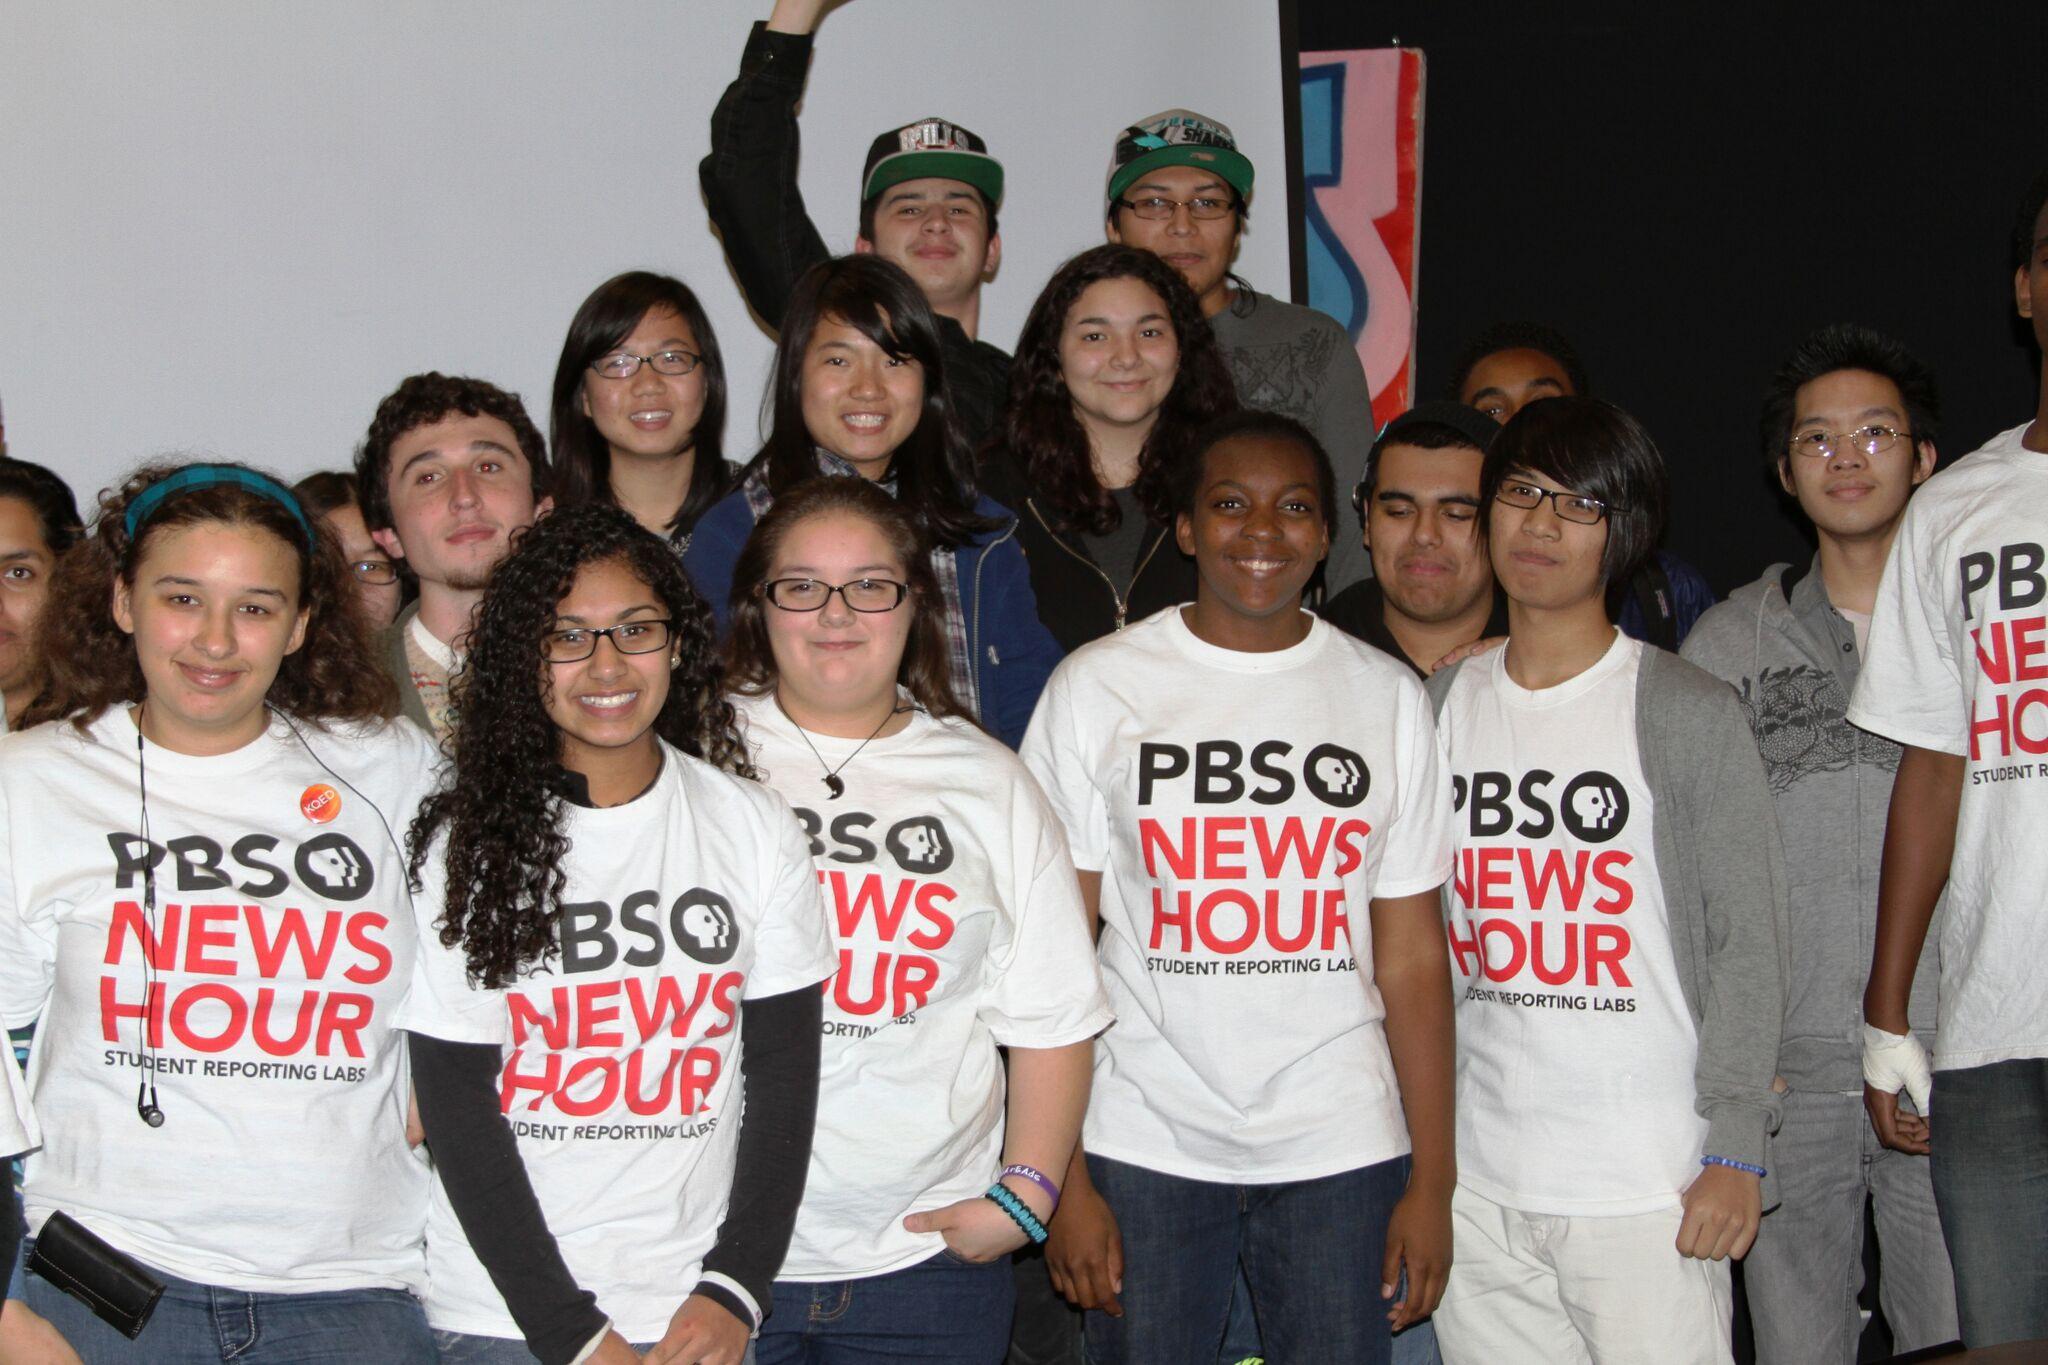 youthbeat_2012_pbsnewshour_student_reporting_labs.jpeg